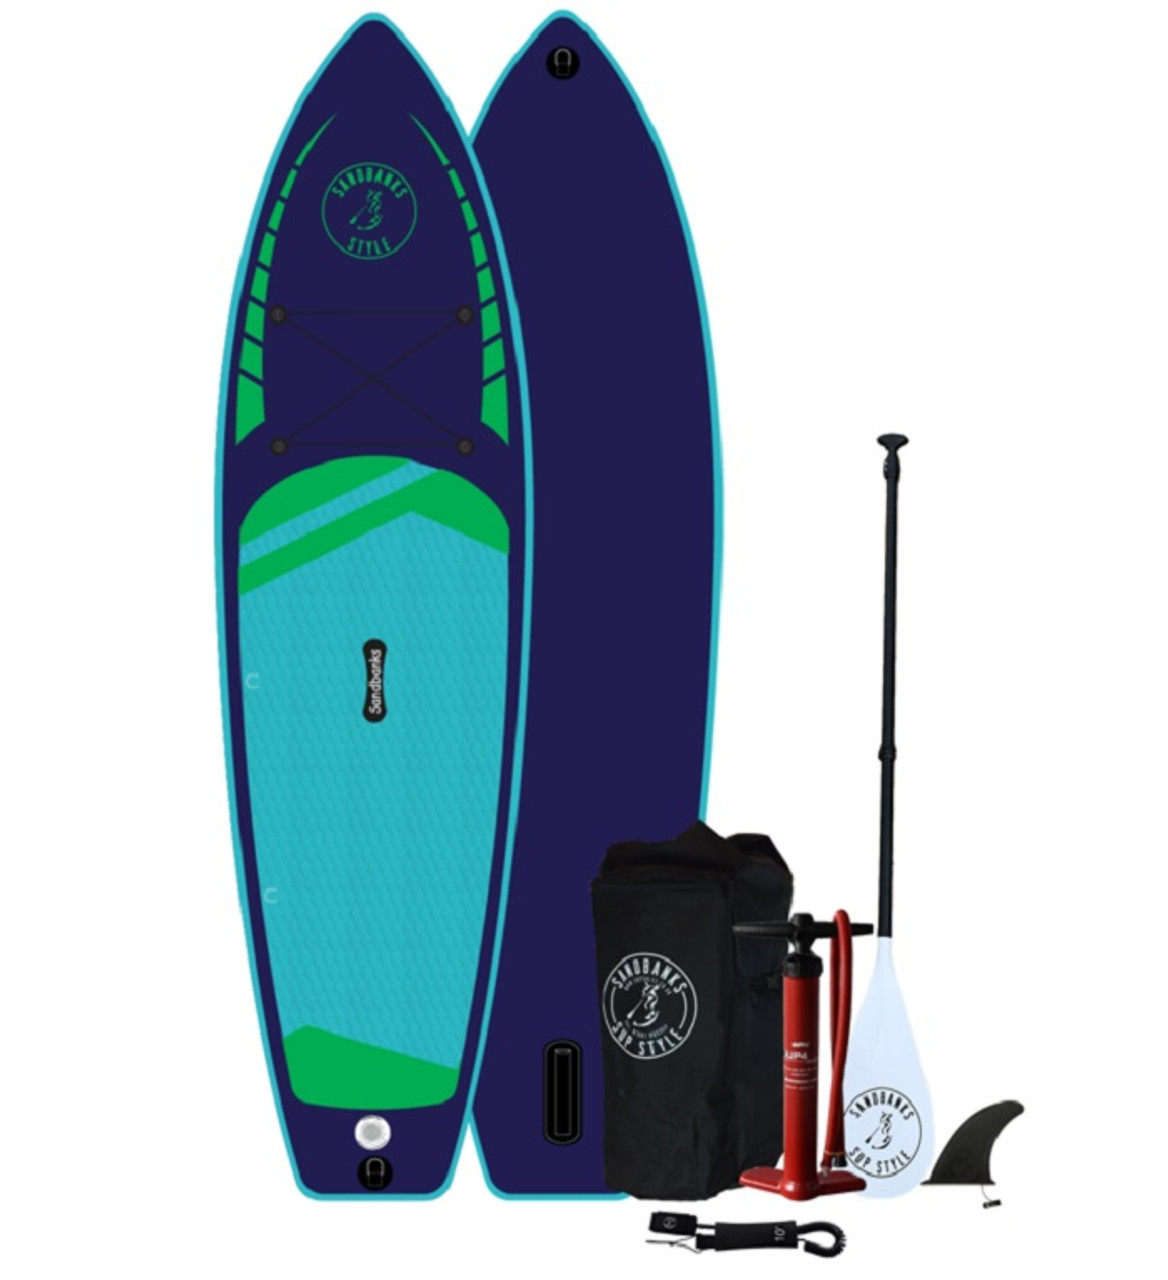 Sandbanks Elite paddle board in midnight blue